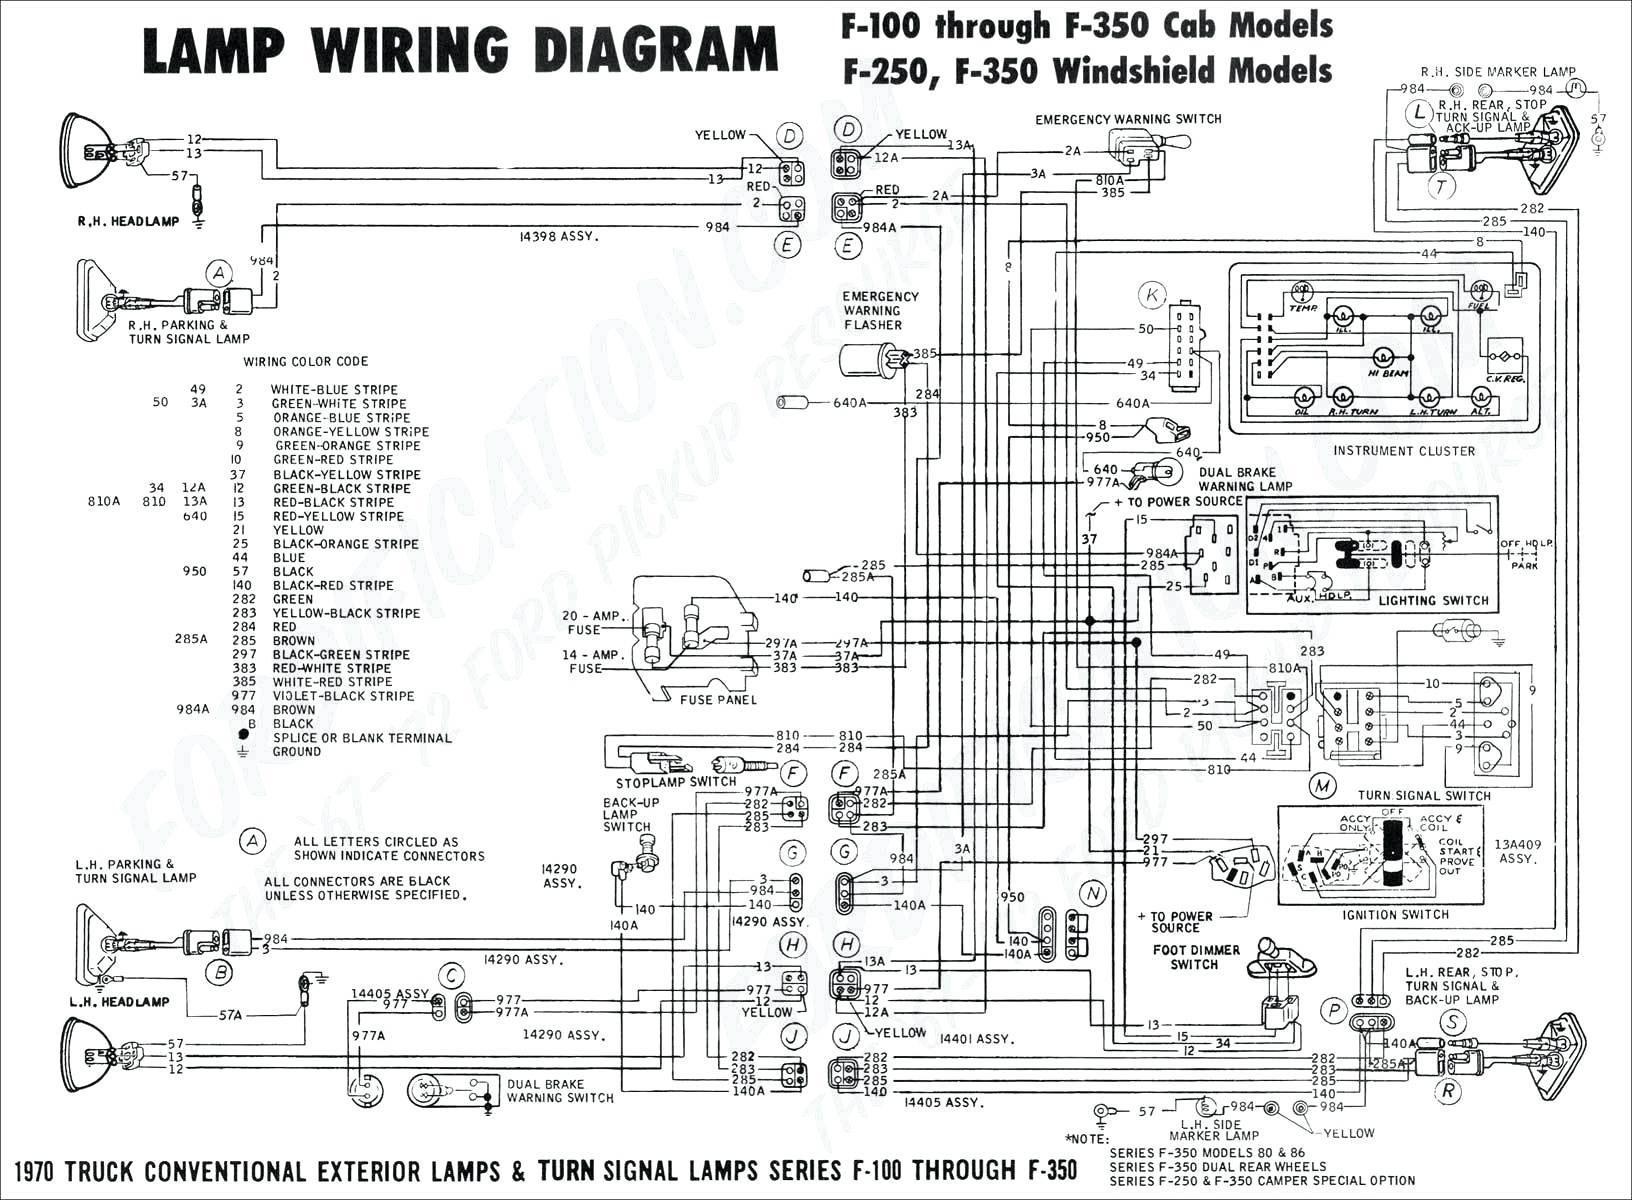 2003 ford Ranger 2 3 Engine Diagram 84 F250 Wiring Diagram Experts Wiring Diagram • Of 2003 ford Ranger 2 3 Engine Diagram